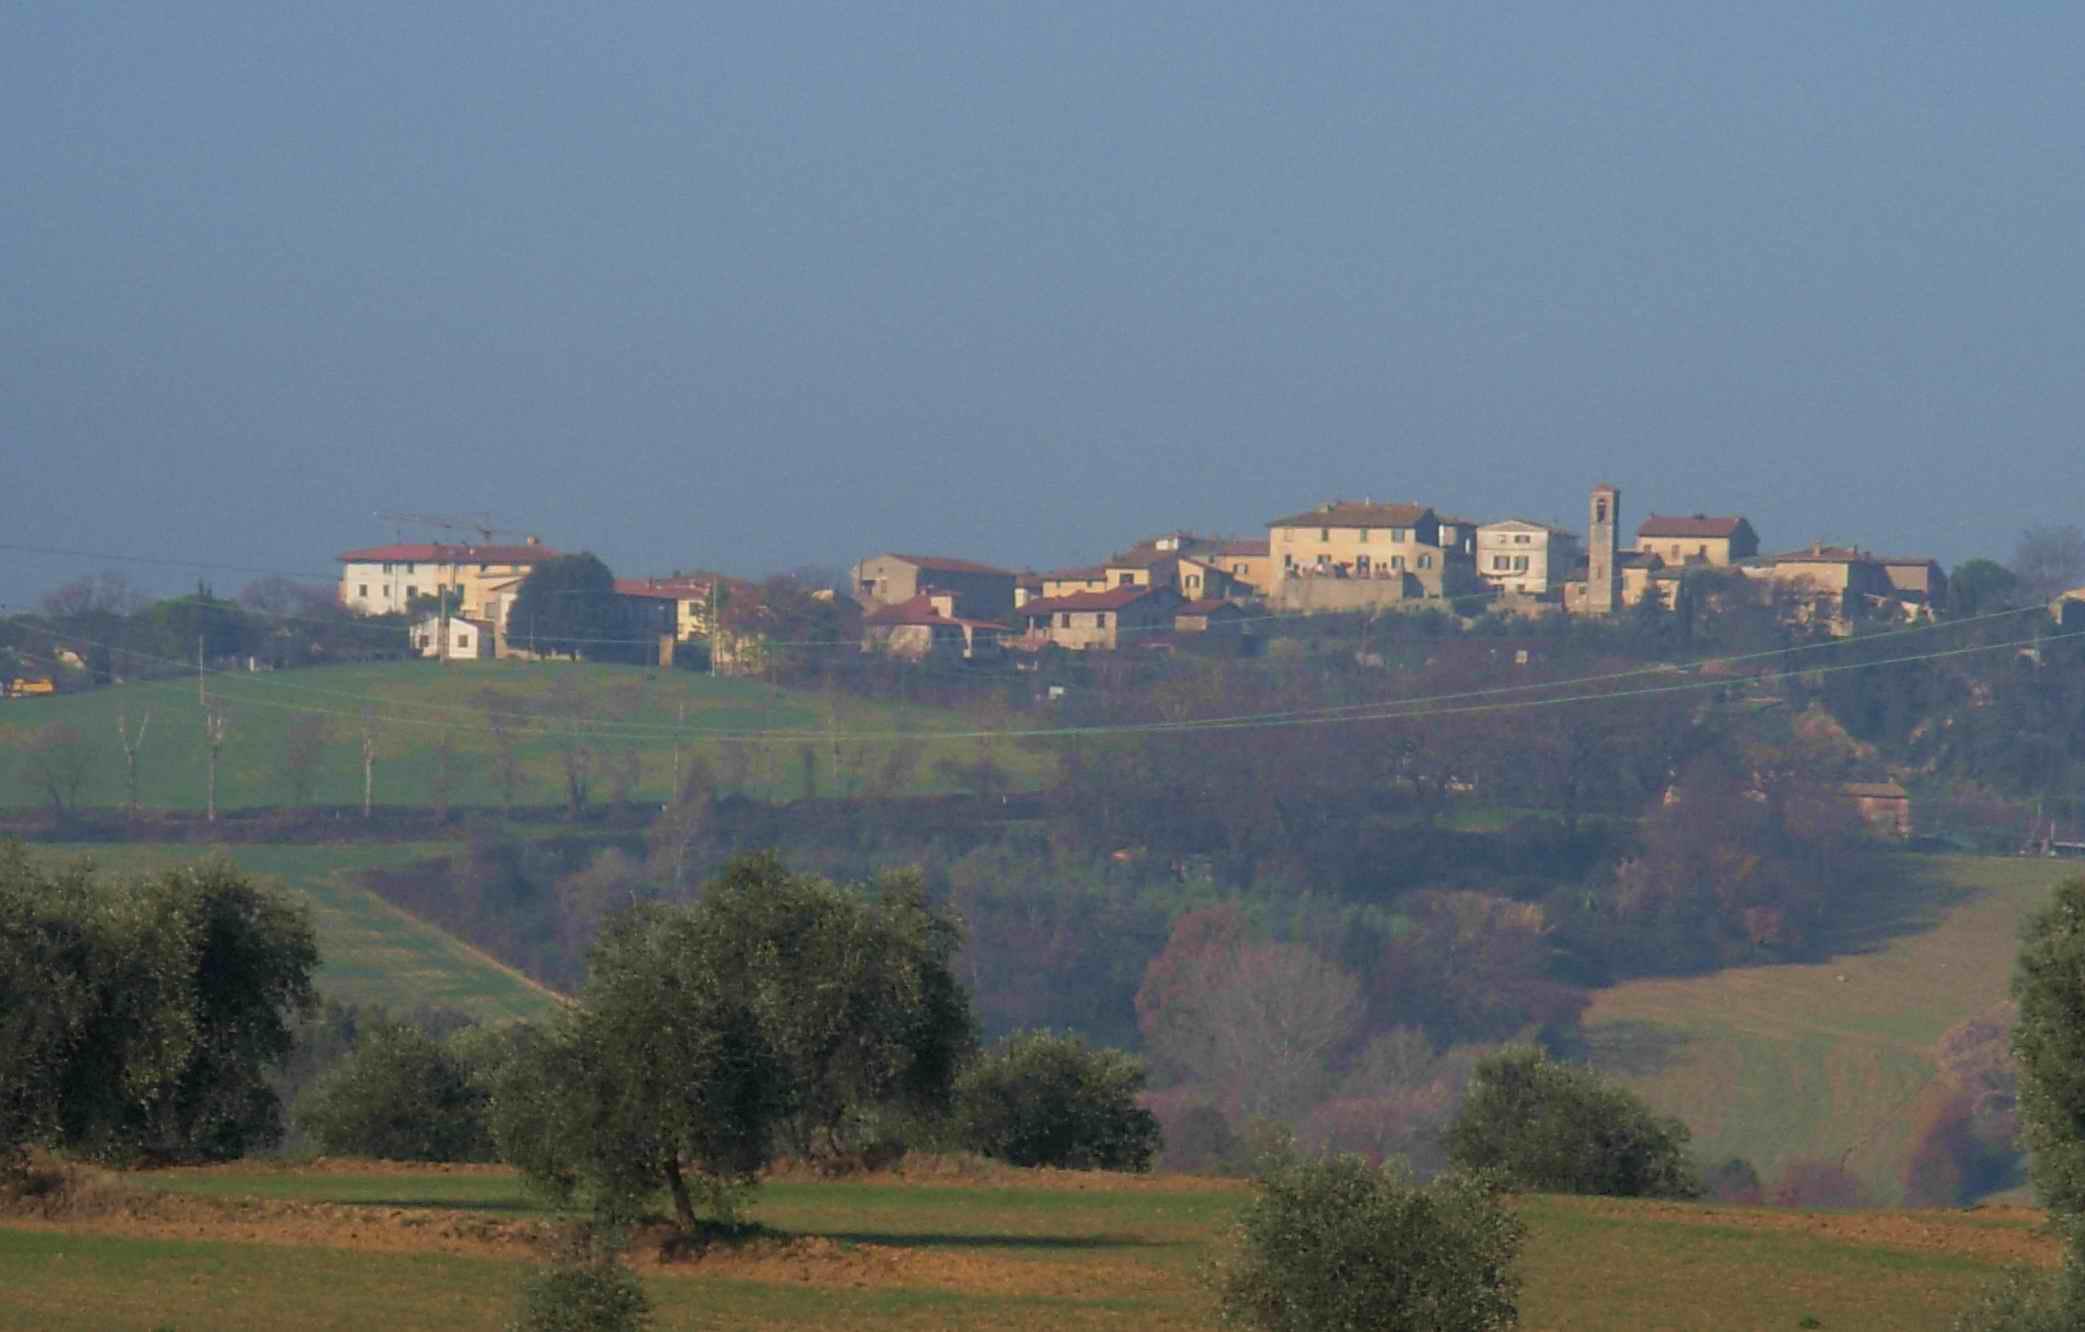 Incidente a Castel San Gimignano, coinvolto scuolabus